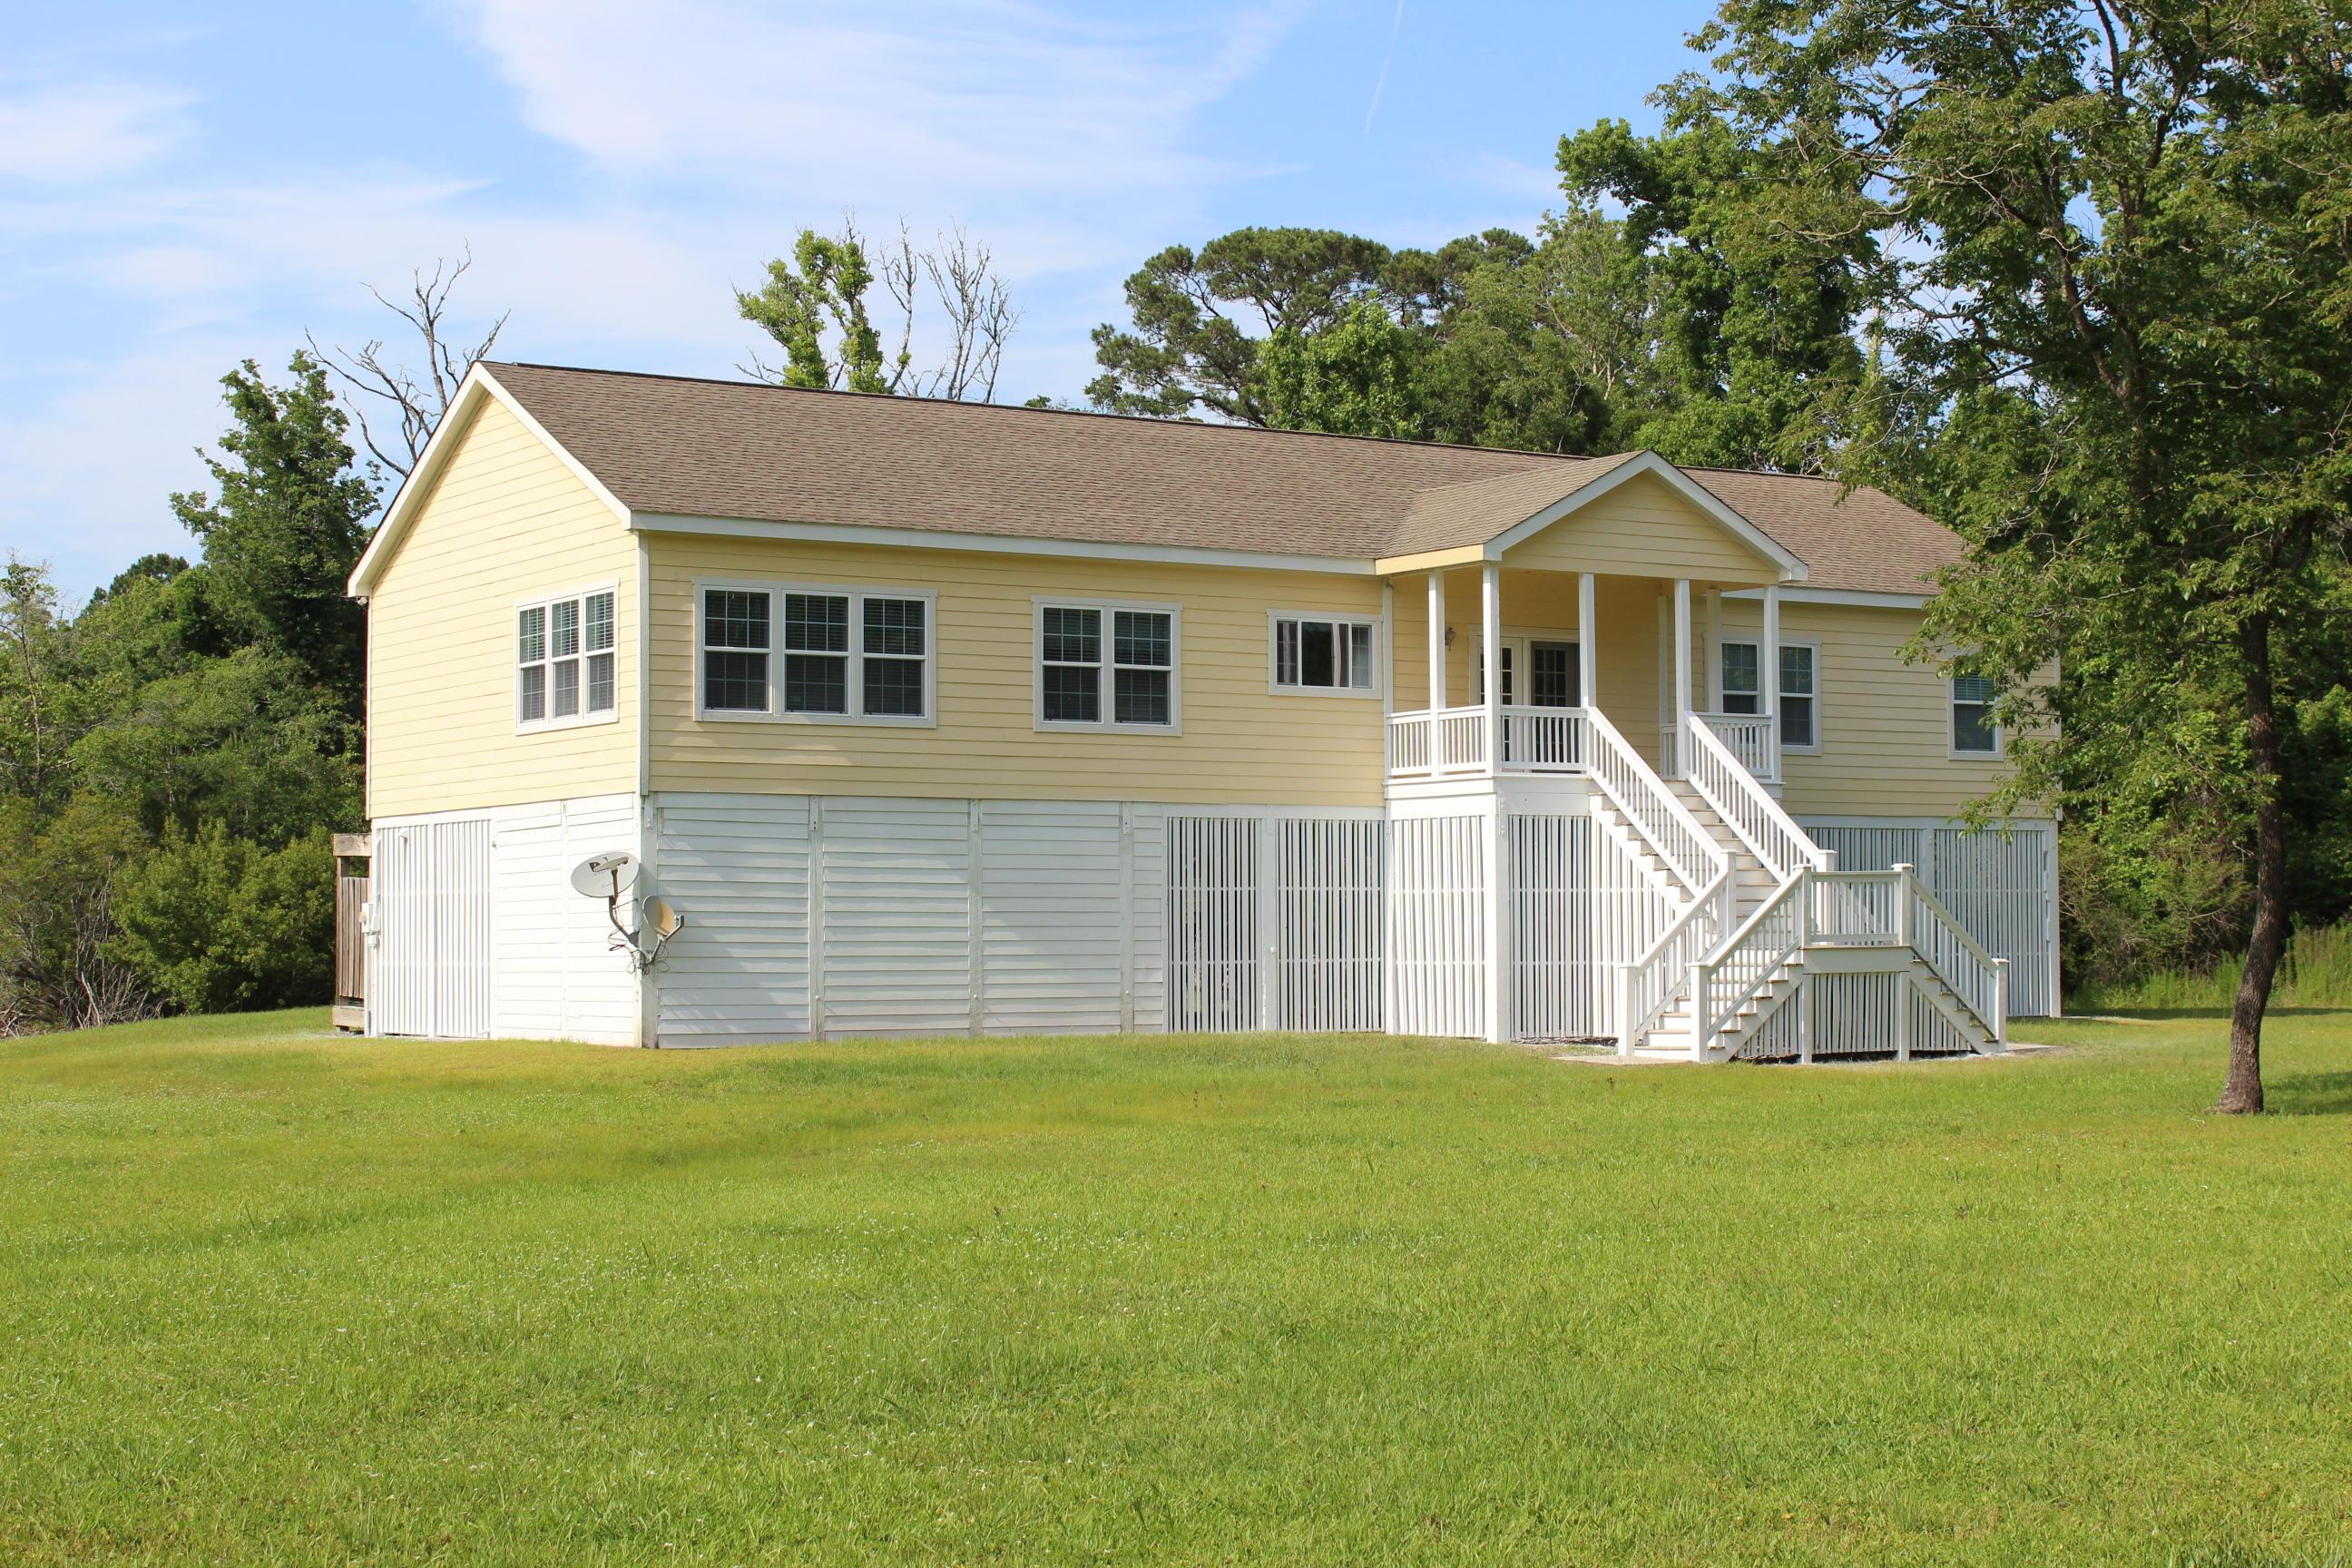 Edisto Island Homes For Sale - 8184 Oyster Factory, Edisto Island, SC - 15